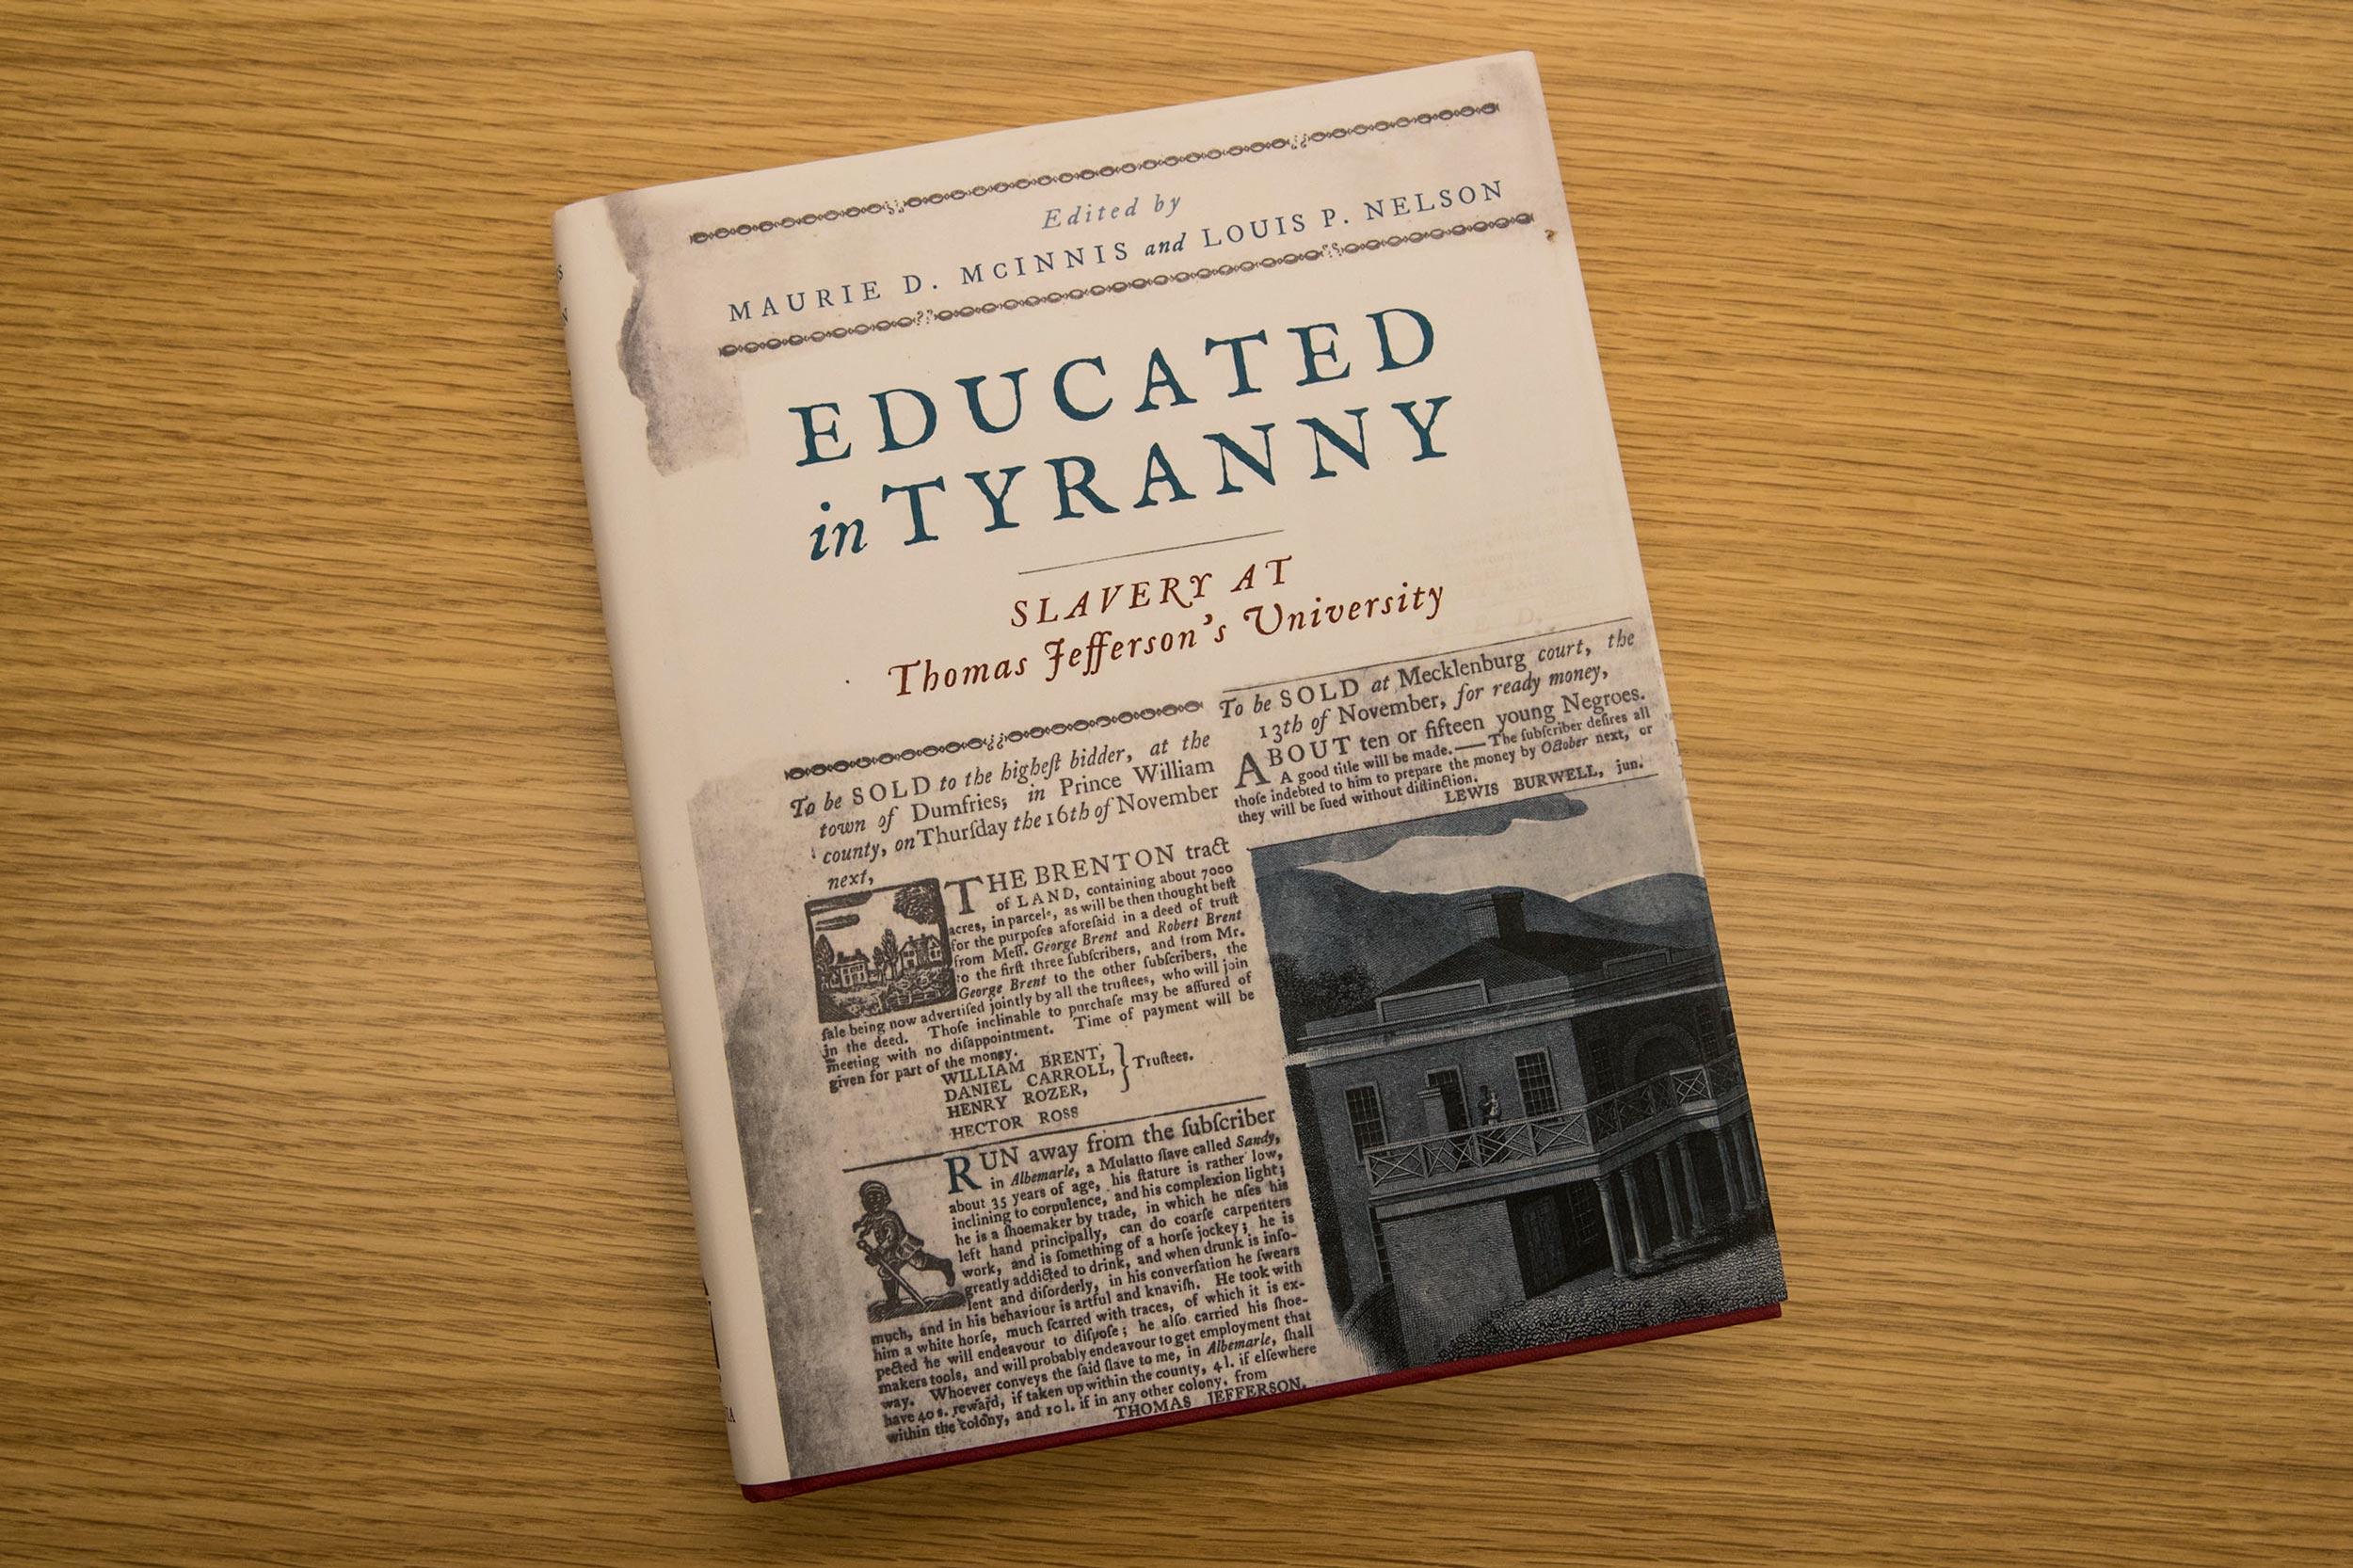 A Foundation for the Future: Thomas Jefferson's University